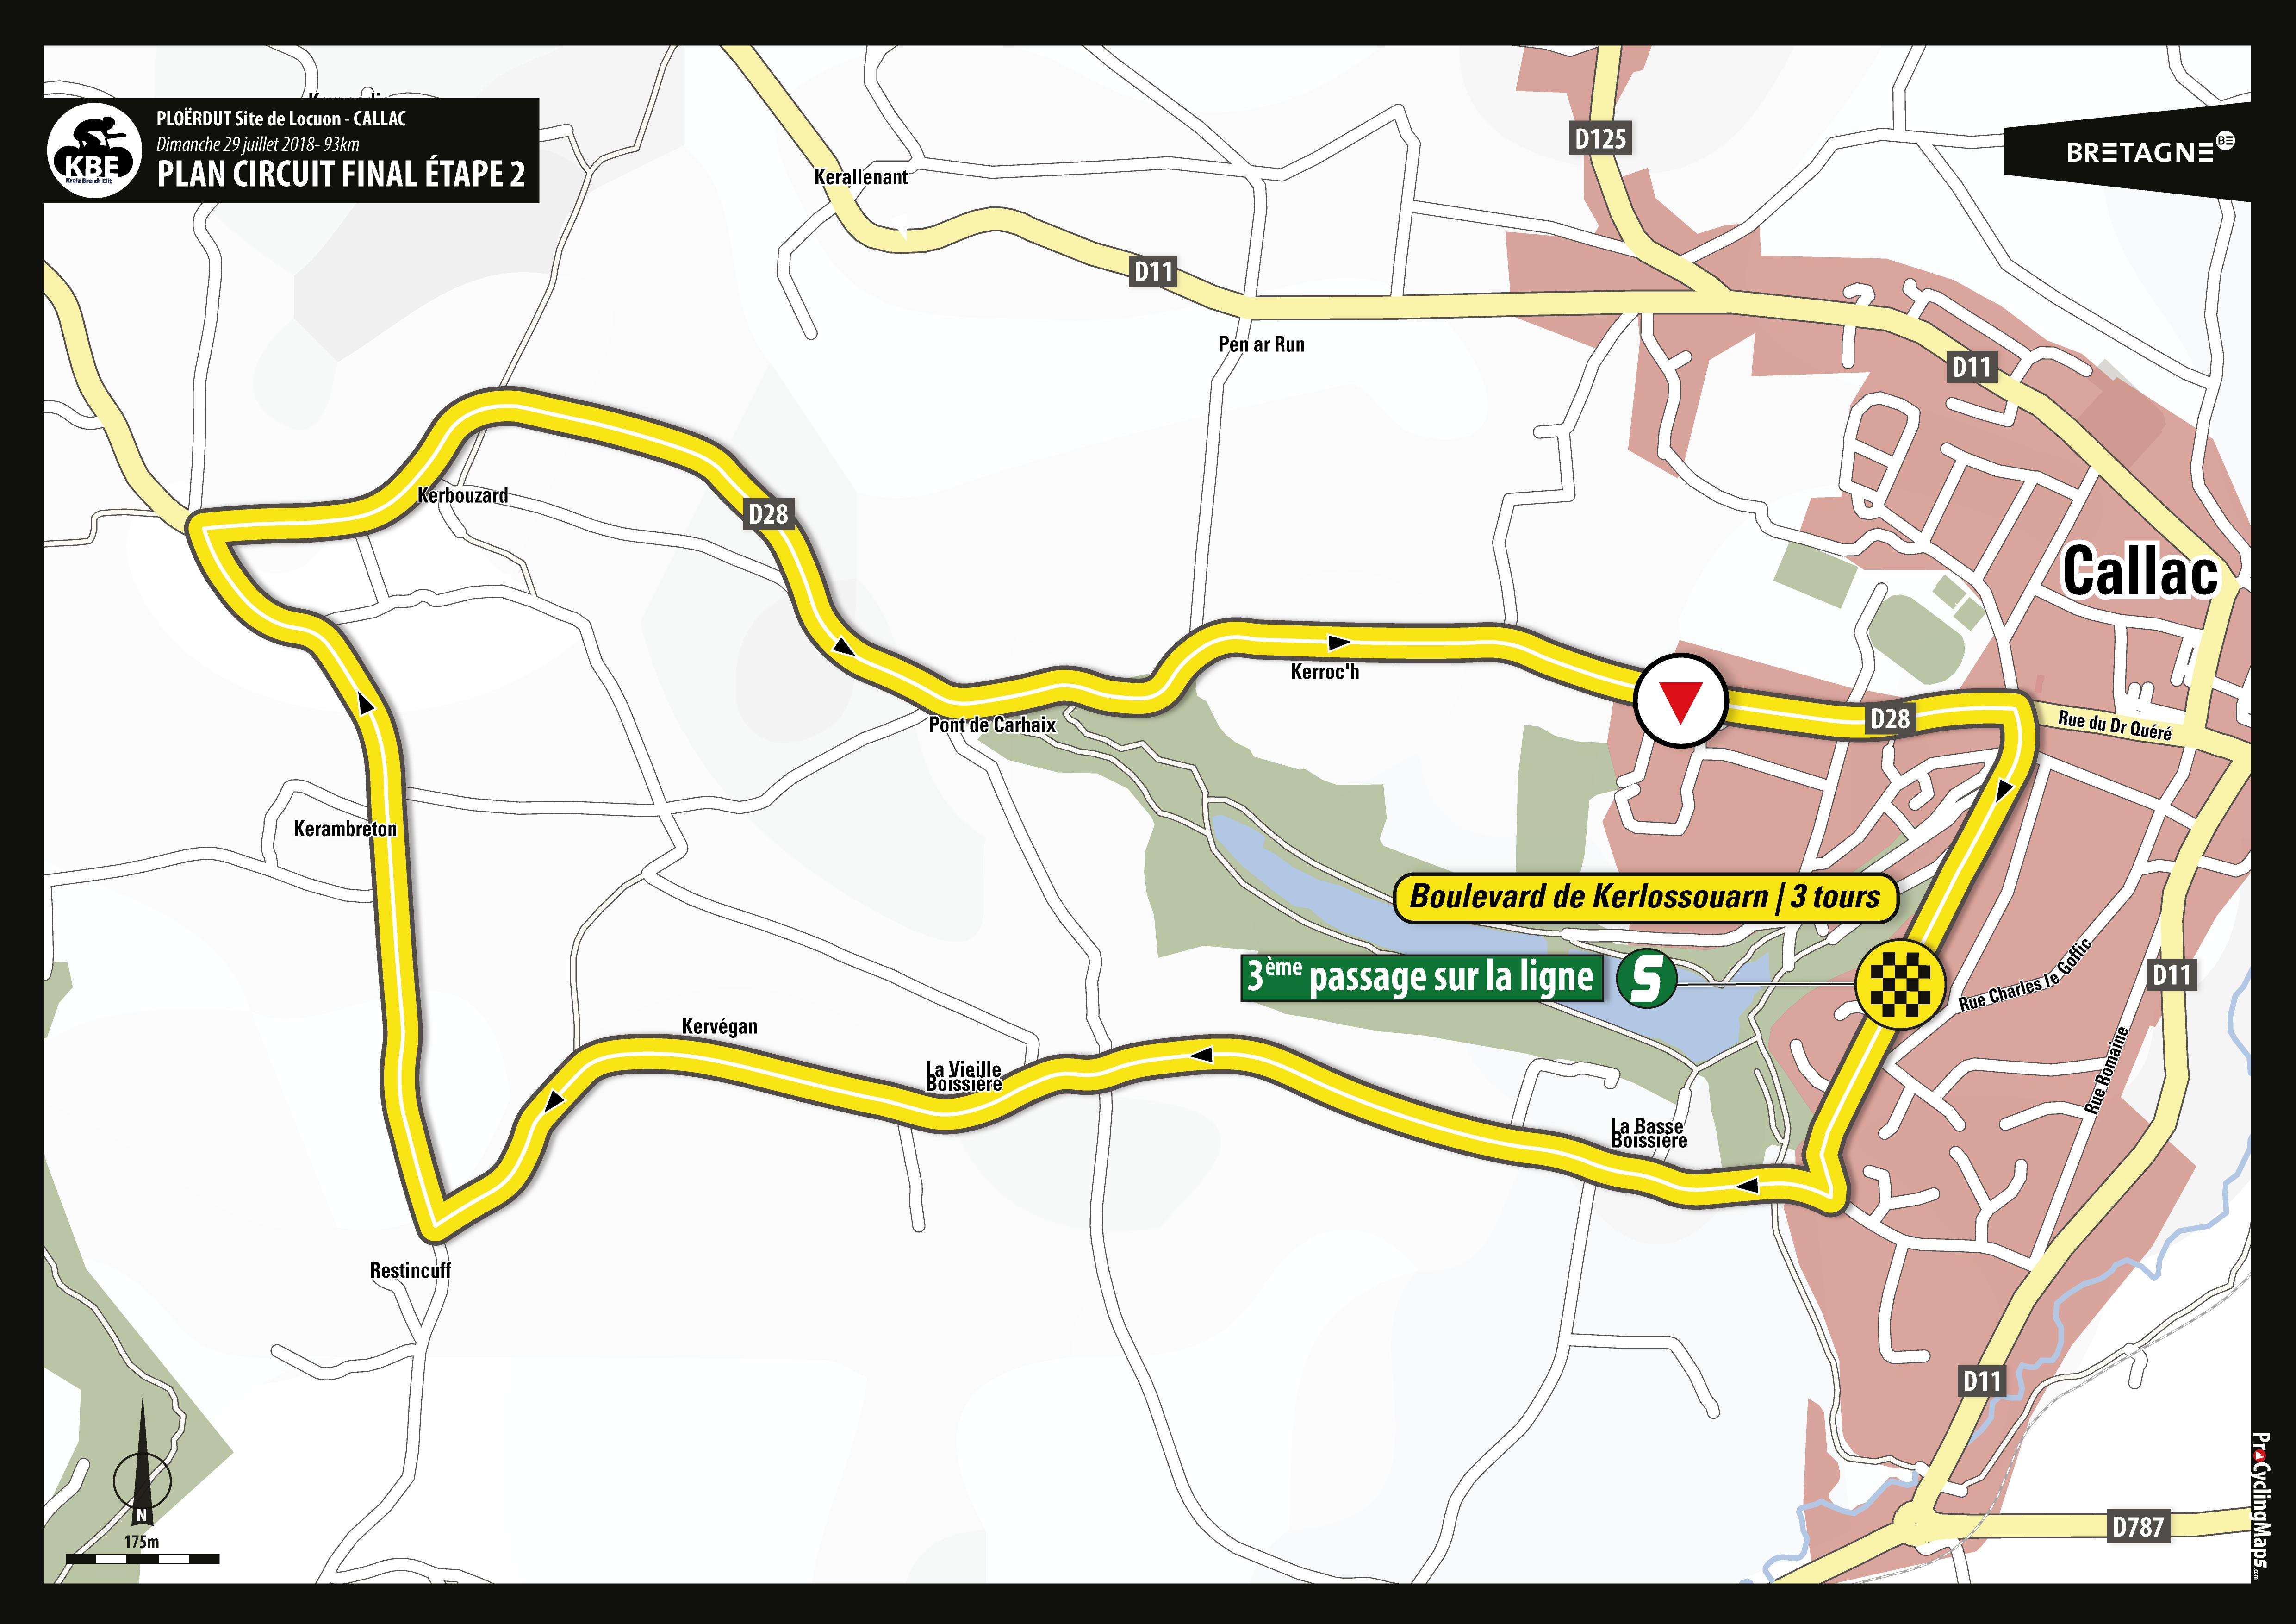 KBE2018 - Plan arrivée circuit final E2 - Callac